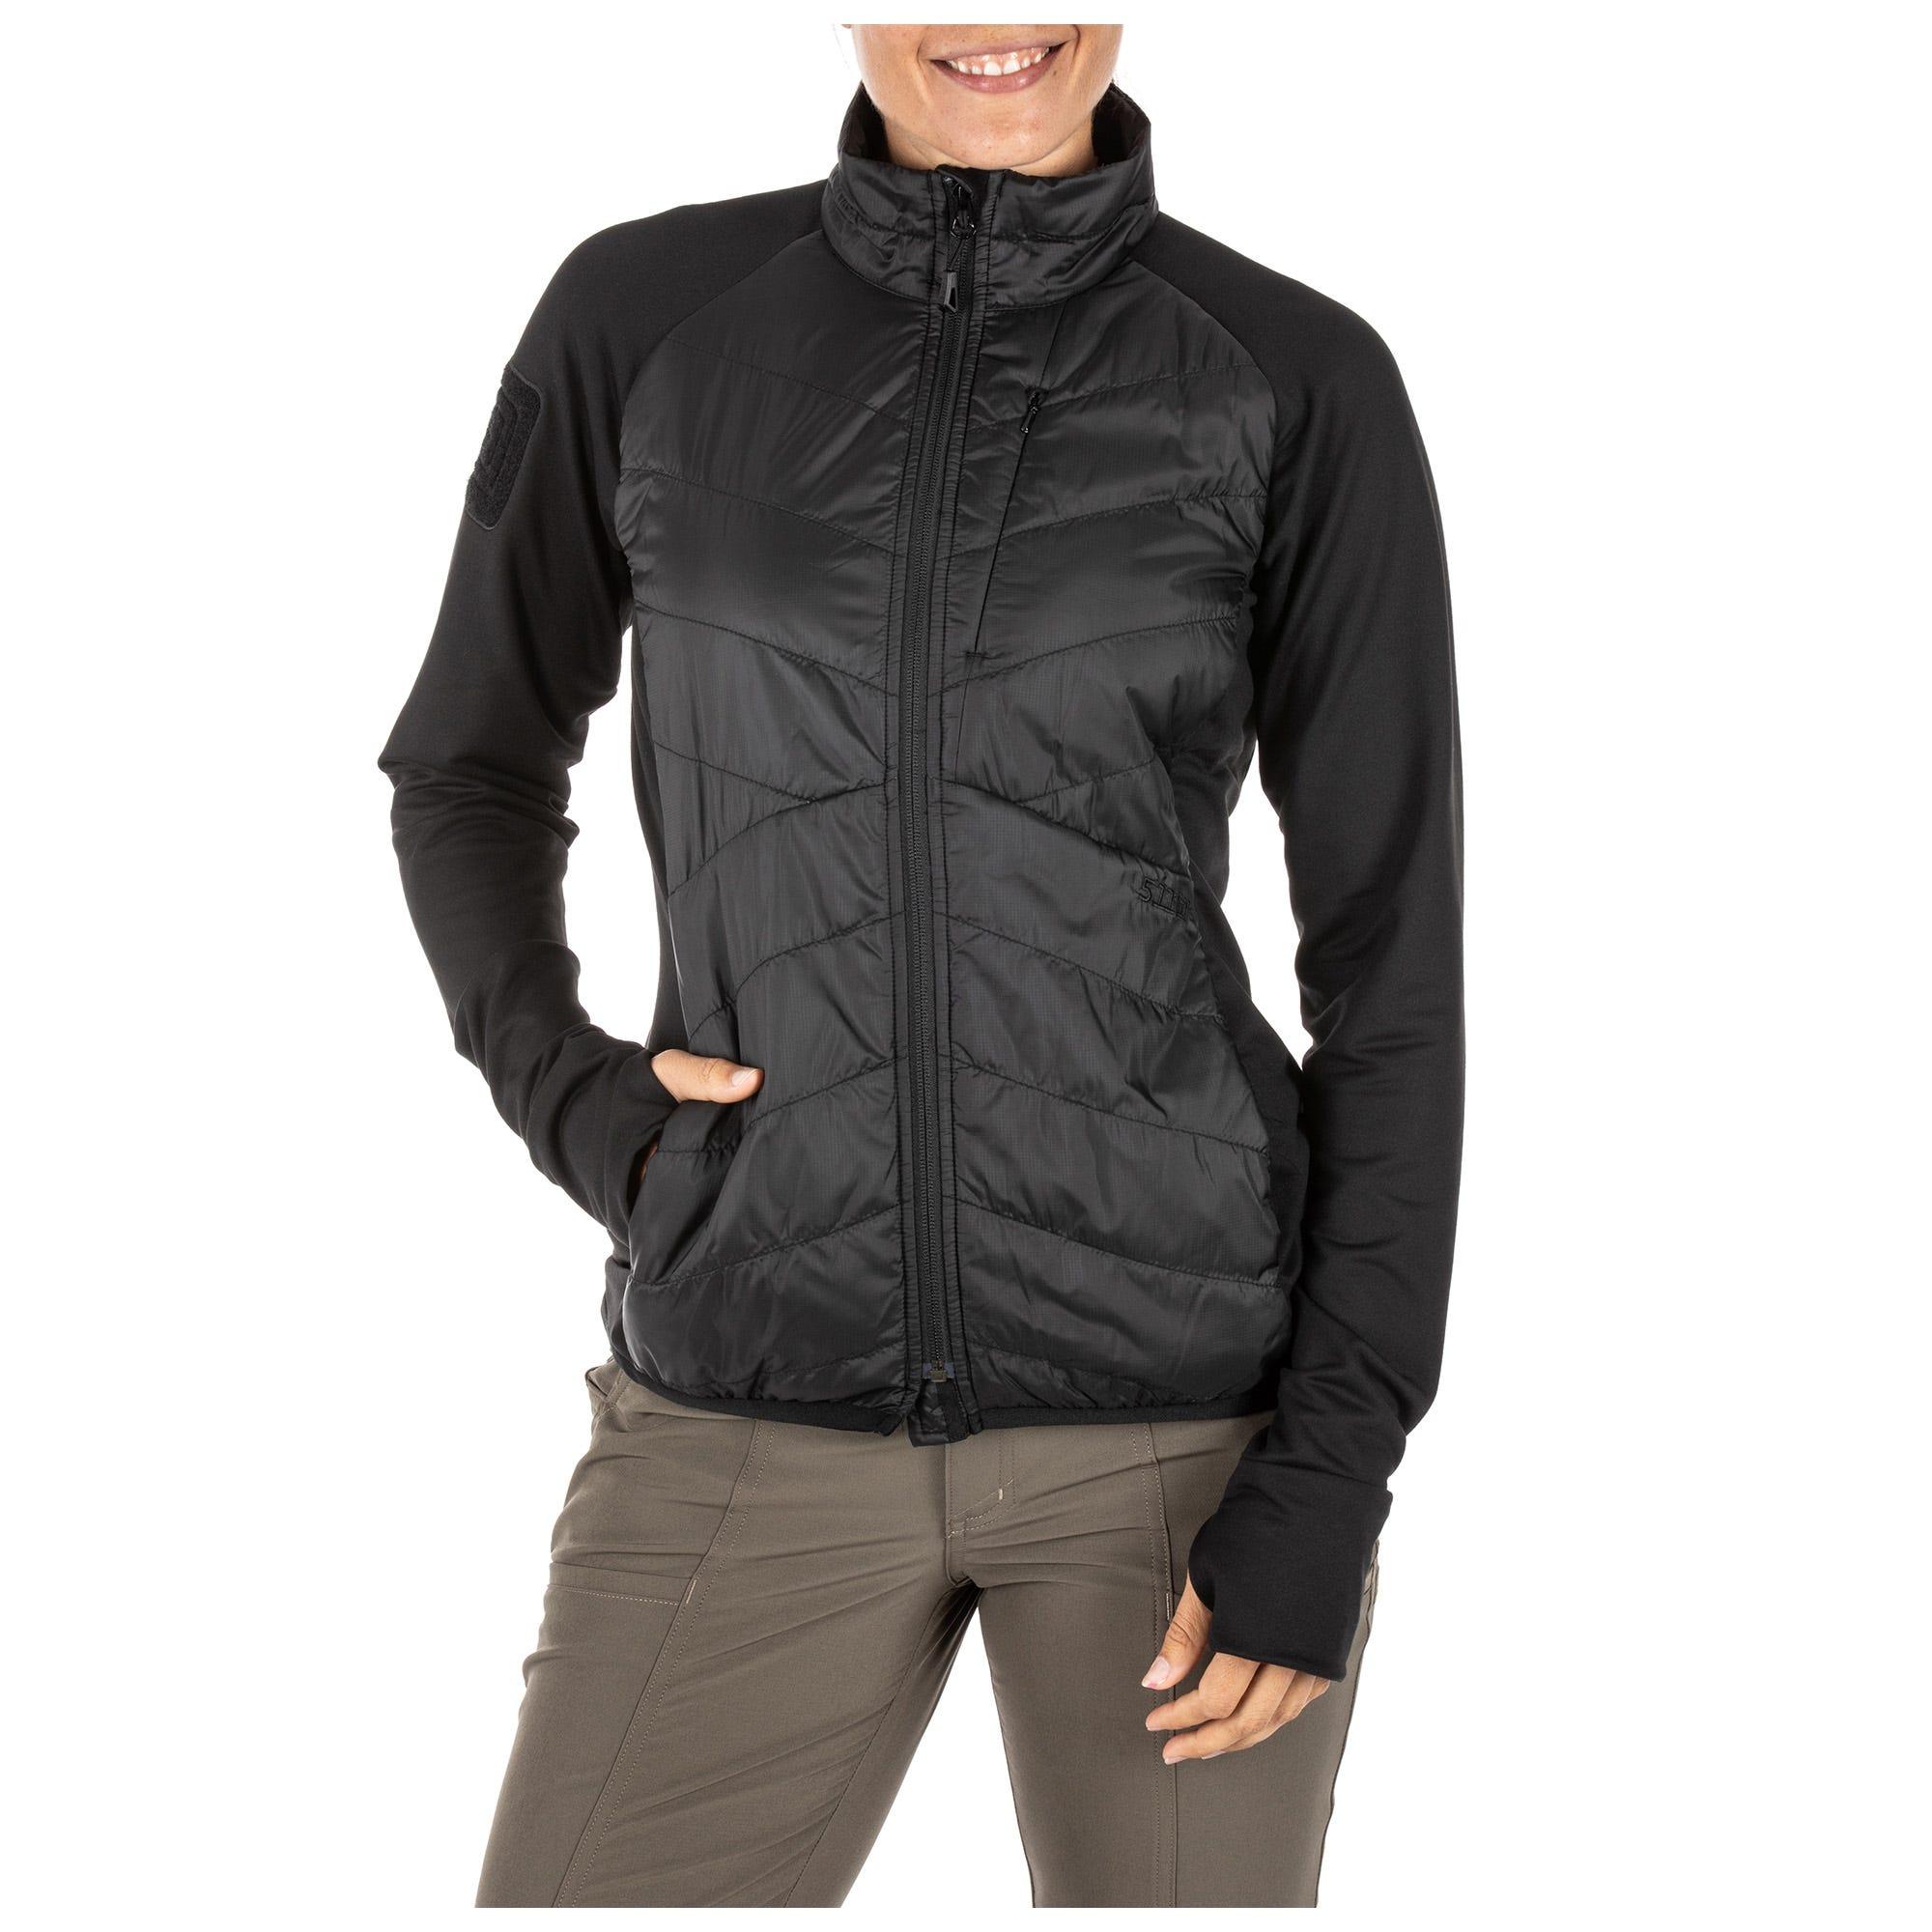 5.11 Tactical Women Women's Peninsula Hybrid Jacket